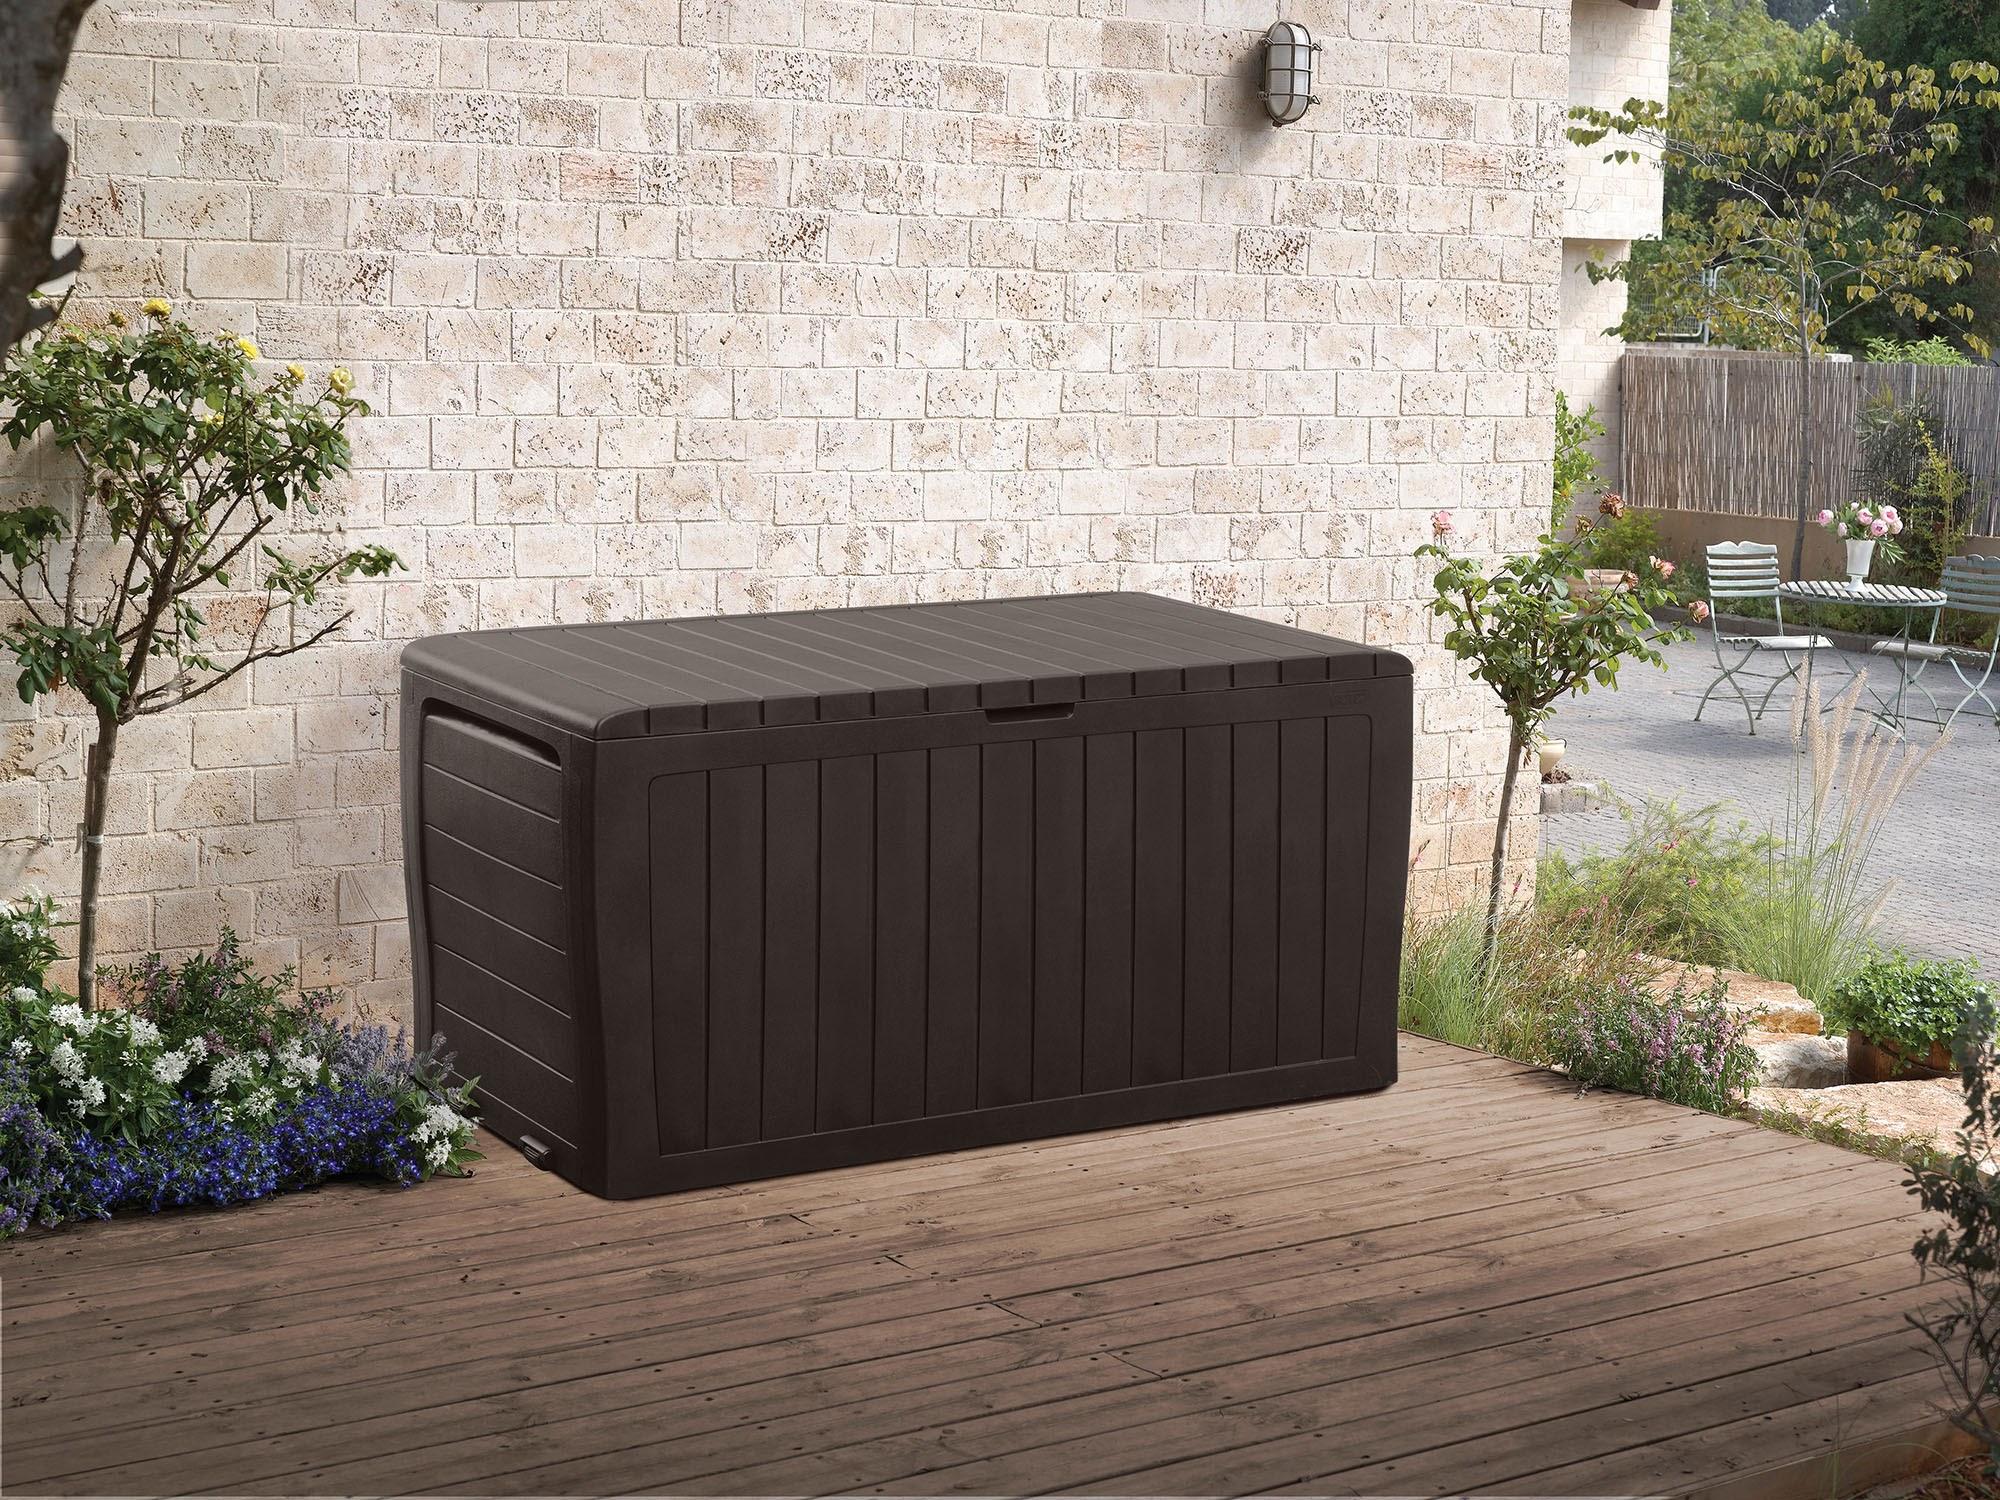 Keter Marvel Plus 71 Gallon Outdoor Storage Deck Box Espresso Brown $48 @Amazon